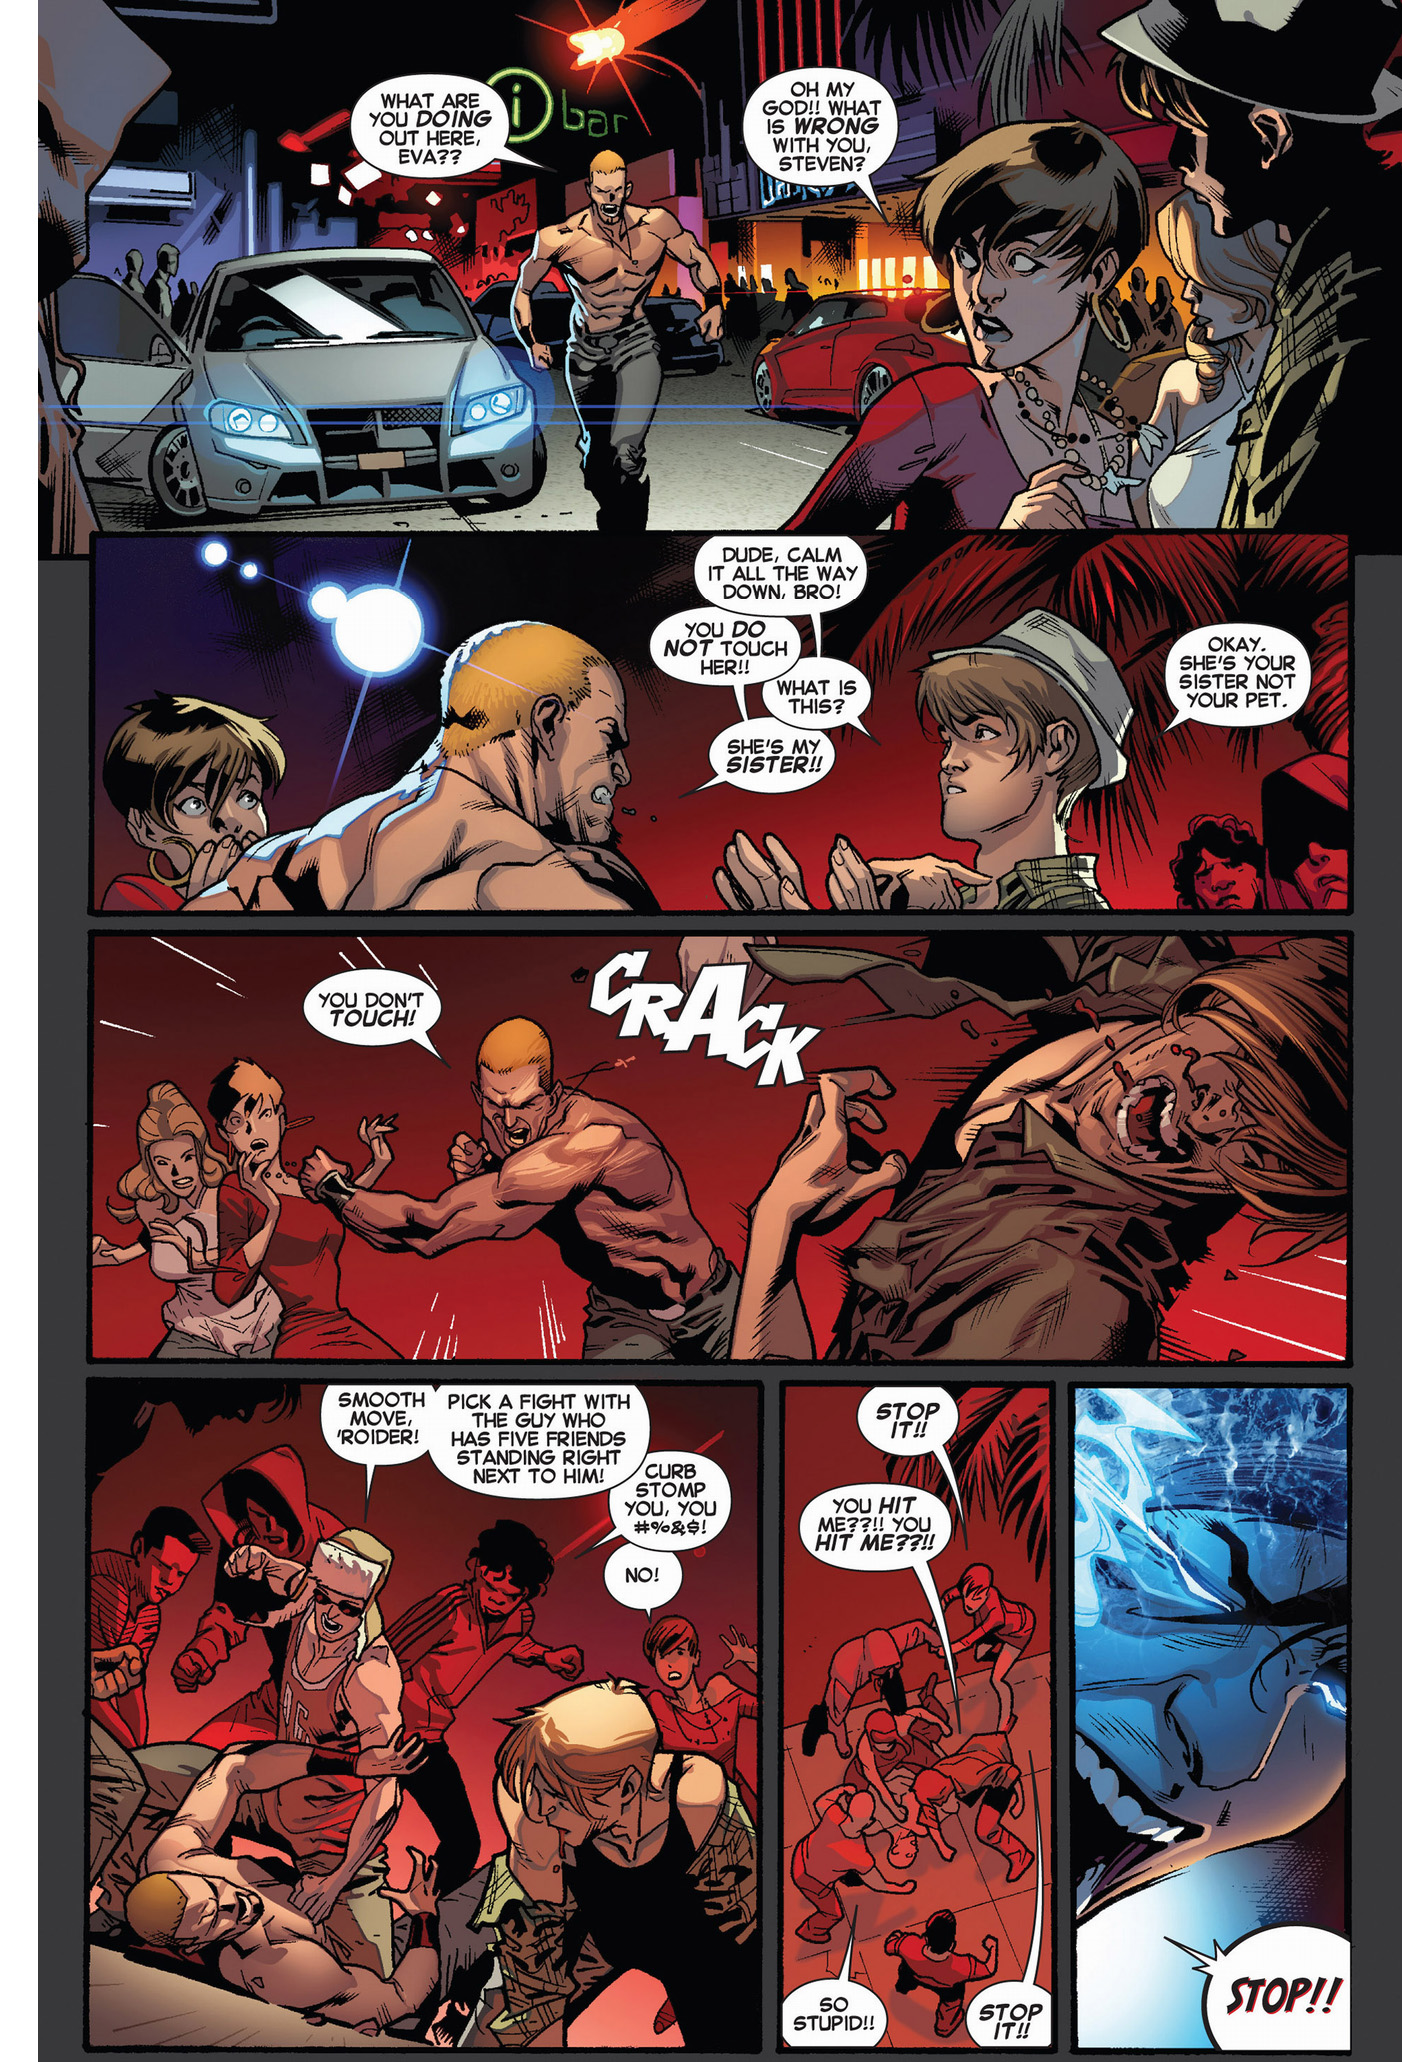 eva bell's mutant powers emerges